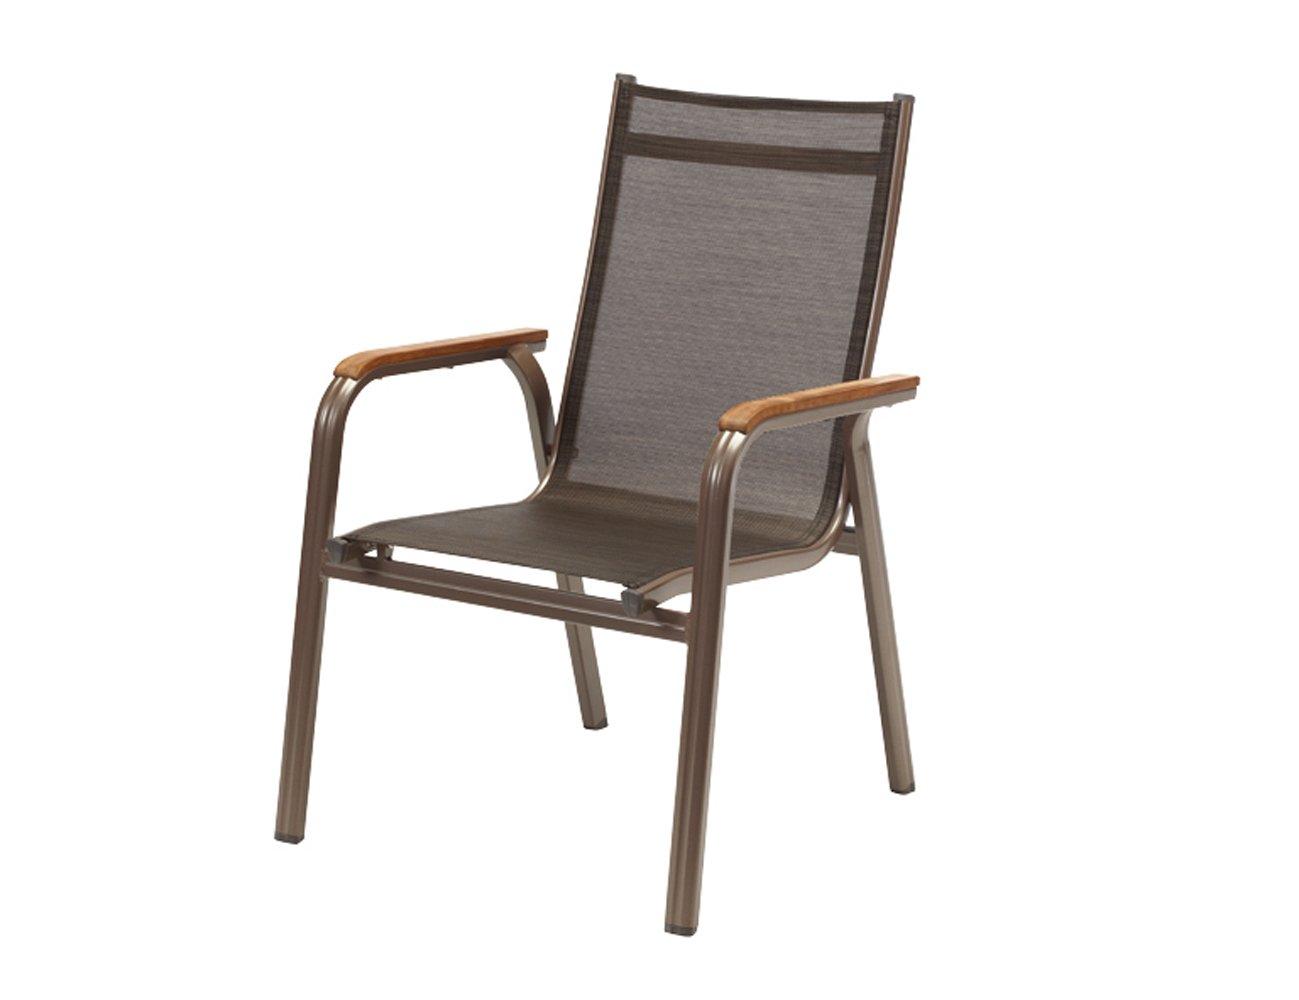 Kettler 0301202-2100 Stapelsessel Granada, Aluminiumprofil bronze, Textilbespannung mocca, Armlehnen Teakholz, 69 x 66 x 98 cm